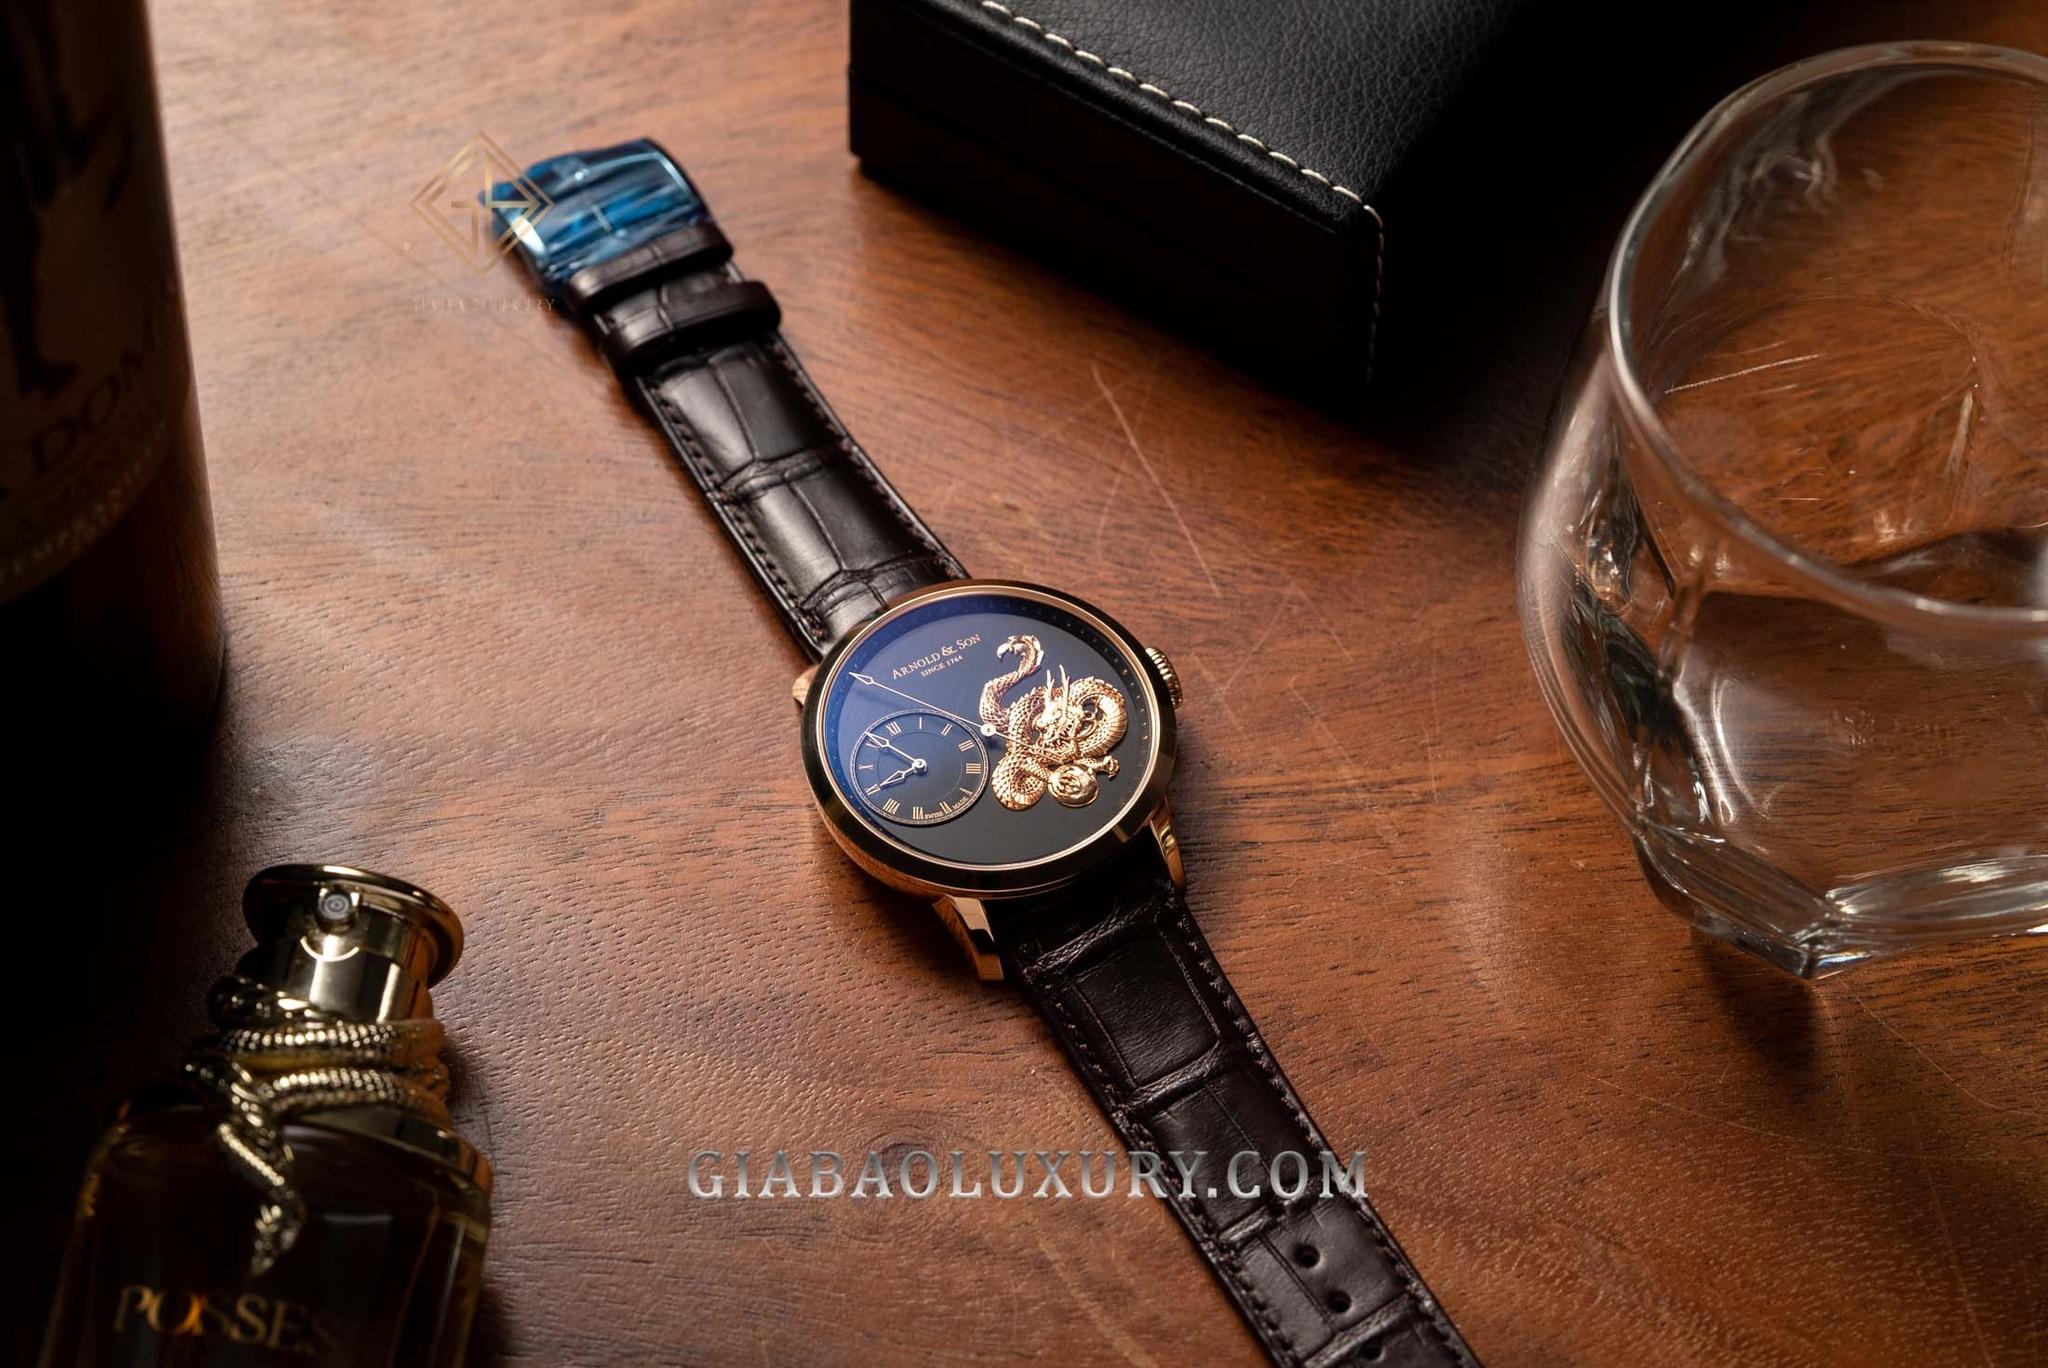 Đồng hồ Arnold & Son Metiers d'Art TB Dragon Limited Edition 1ARAP.B04A.C120P-121P